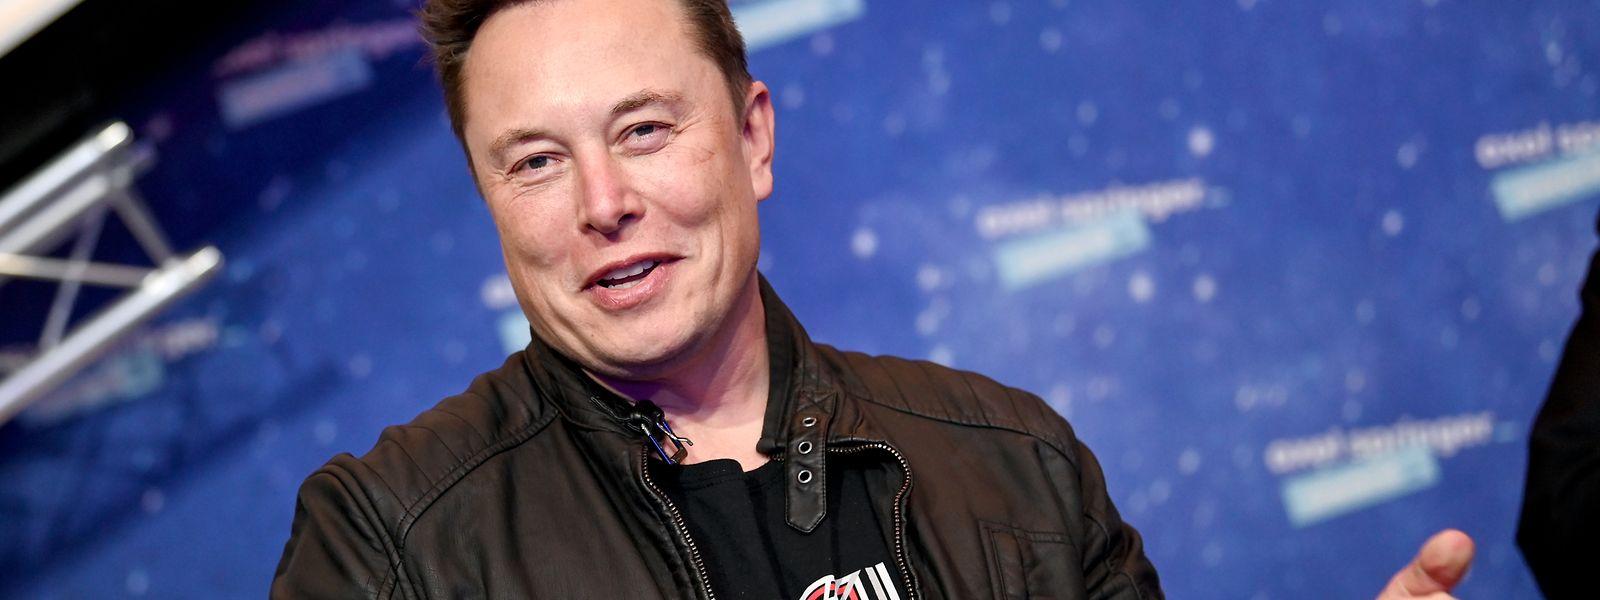 Elon Musk, Tesla-CEO, bei der Verleihung vom Axel Springer Award. Elon Musk wird am 28. Juni 50 Jahre alt.